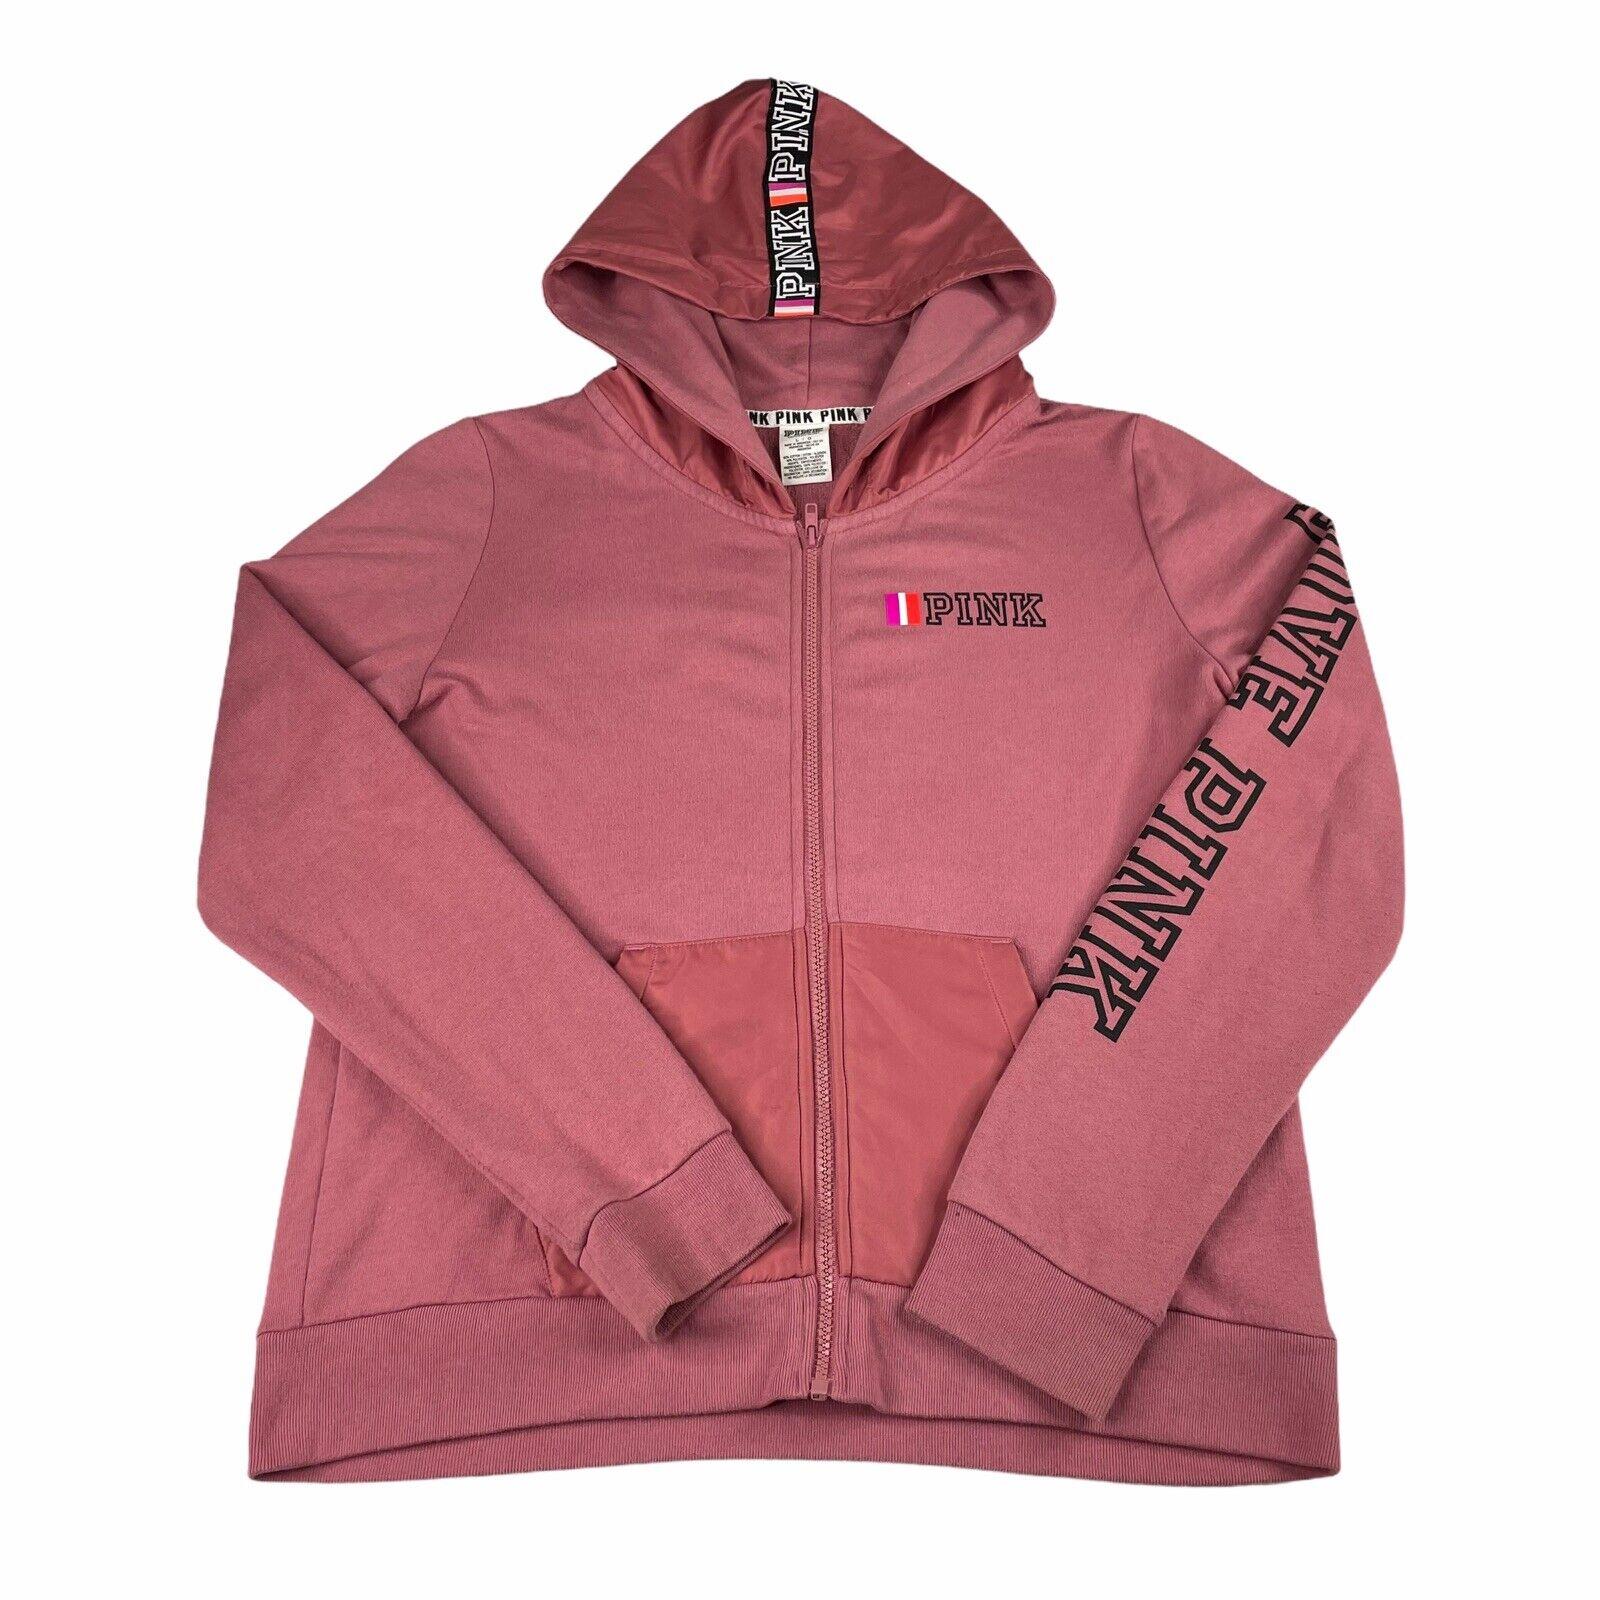 Victoria's Secret Pink Full Zip Hoodie Jacket Begonia Pink Size Large